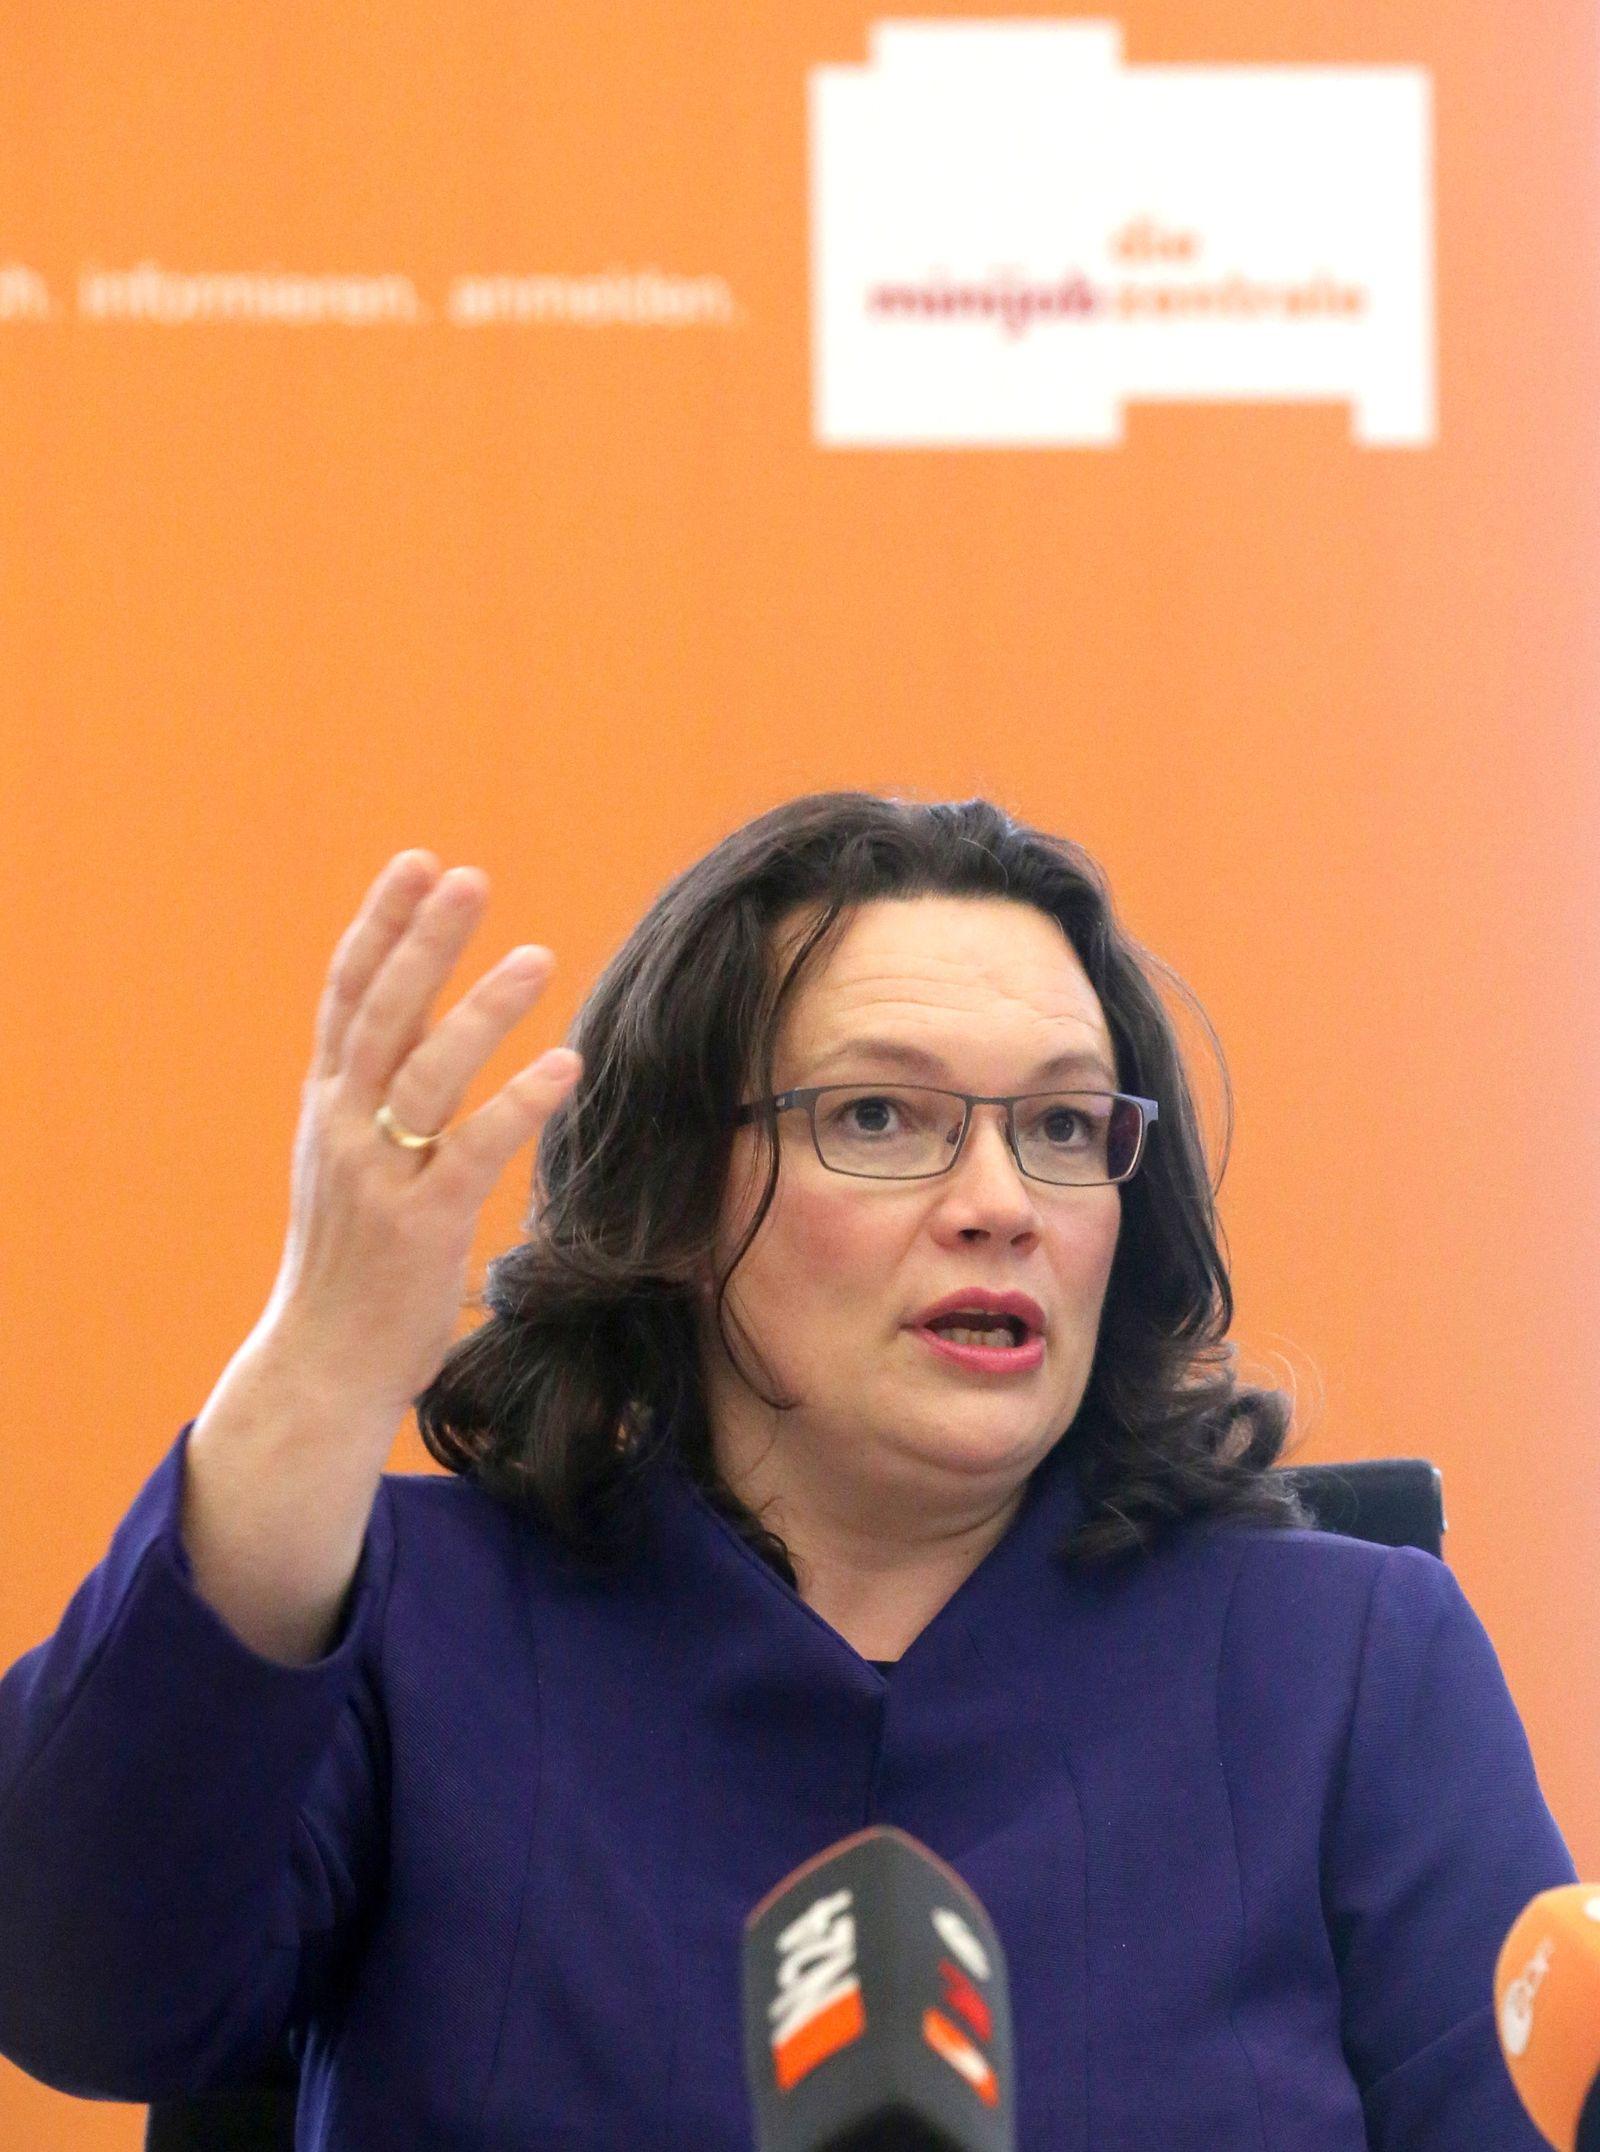 Bundesarbeitsministerin Nahles eröffnet Haushaltsminijobs-Börse